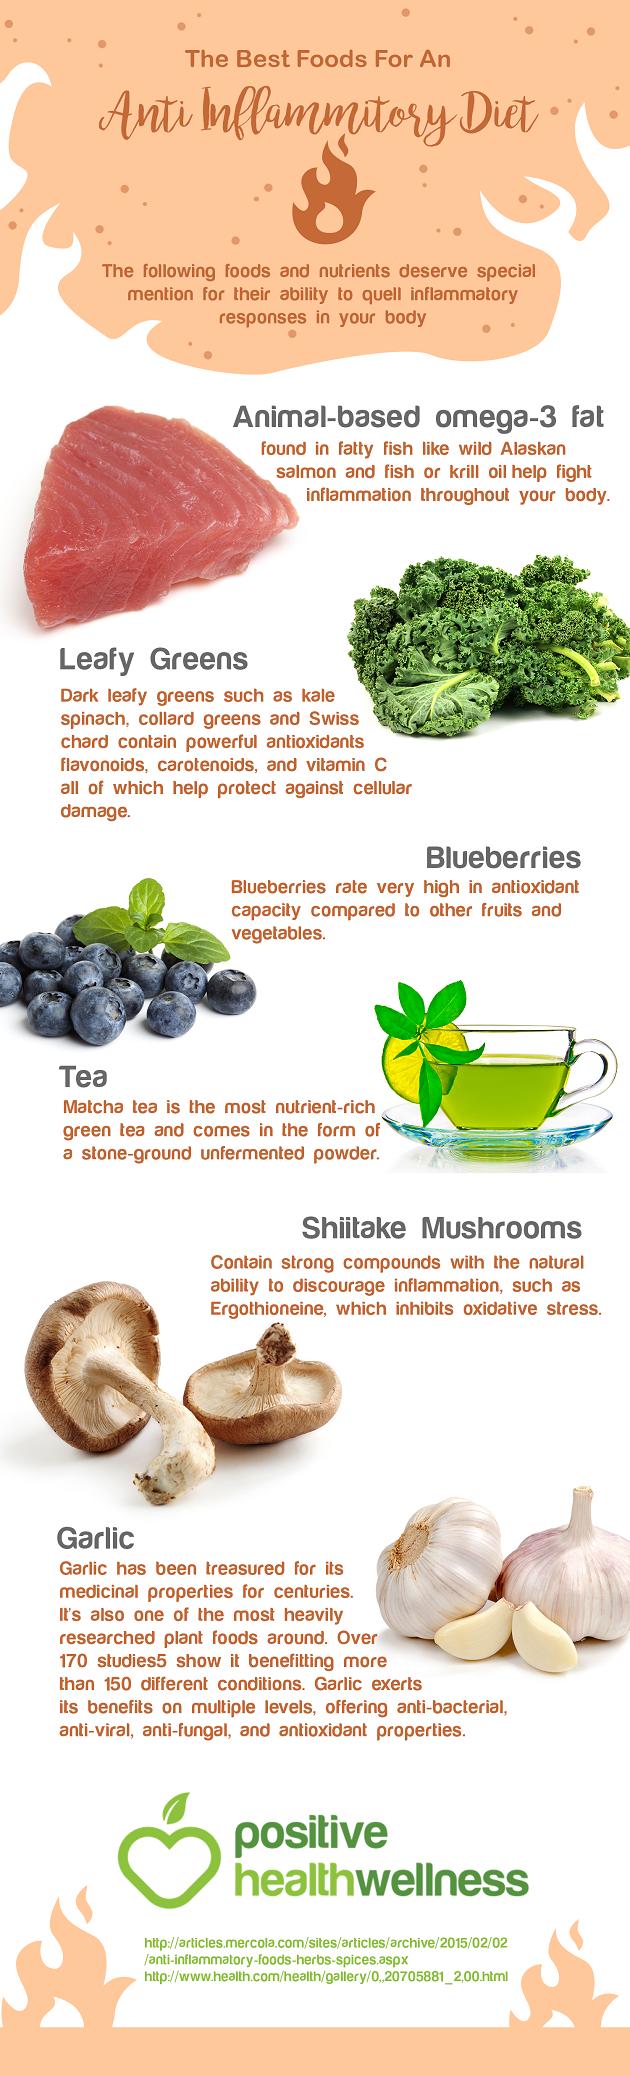 Gastritis cronica moderada dieta